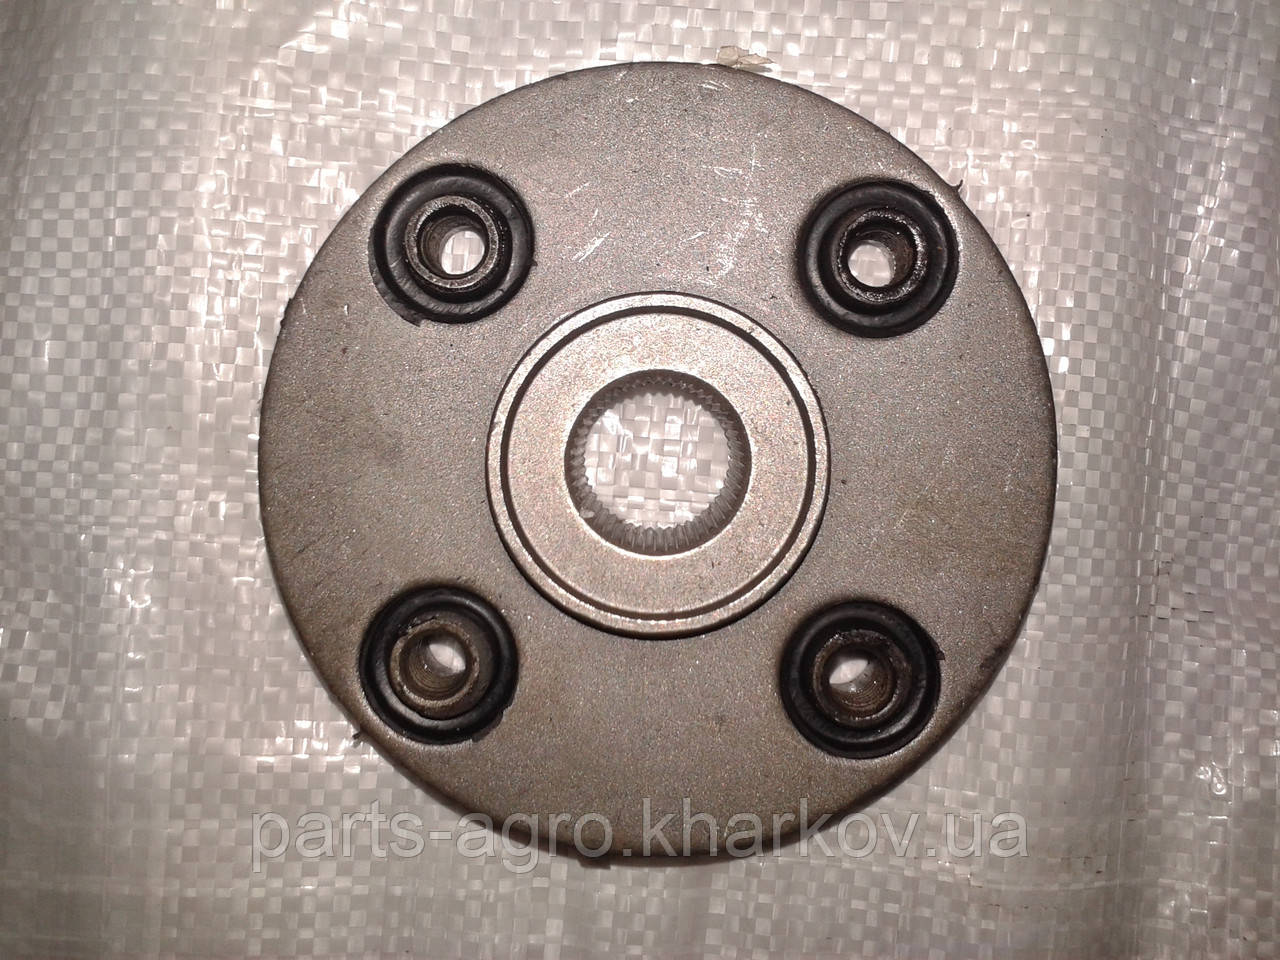 Муфта упругая вентилятора (Производство Россия) 236-1308090 В2